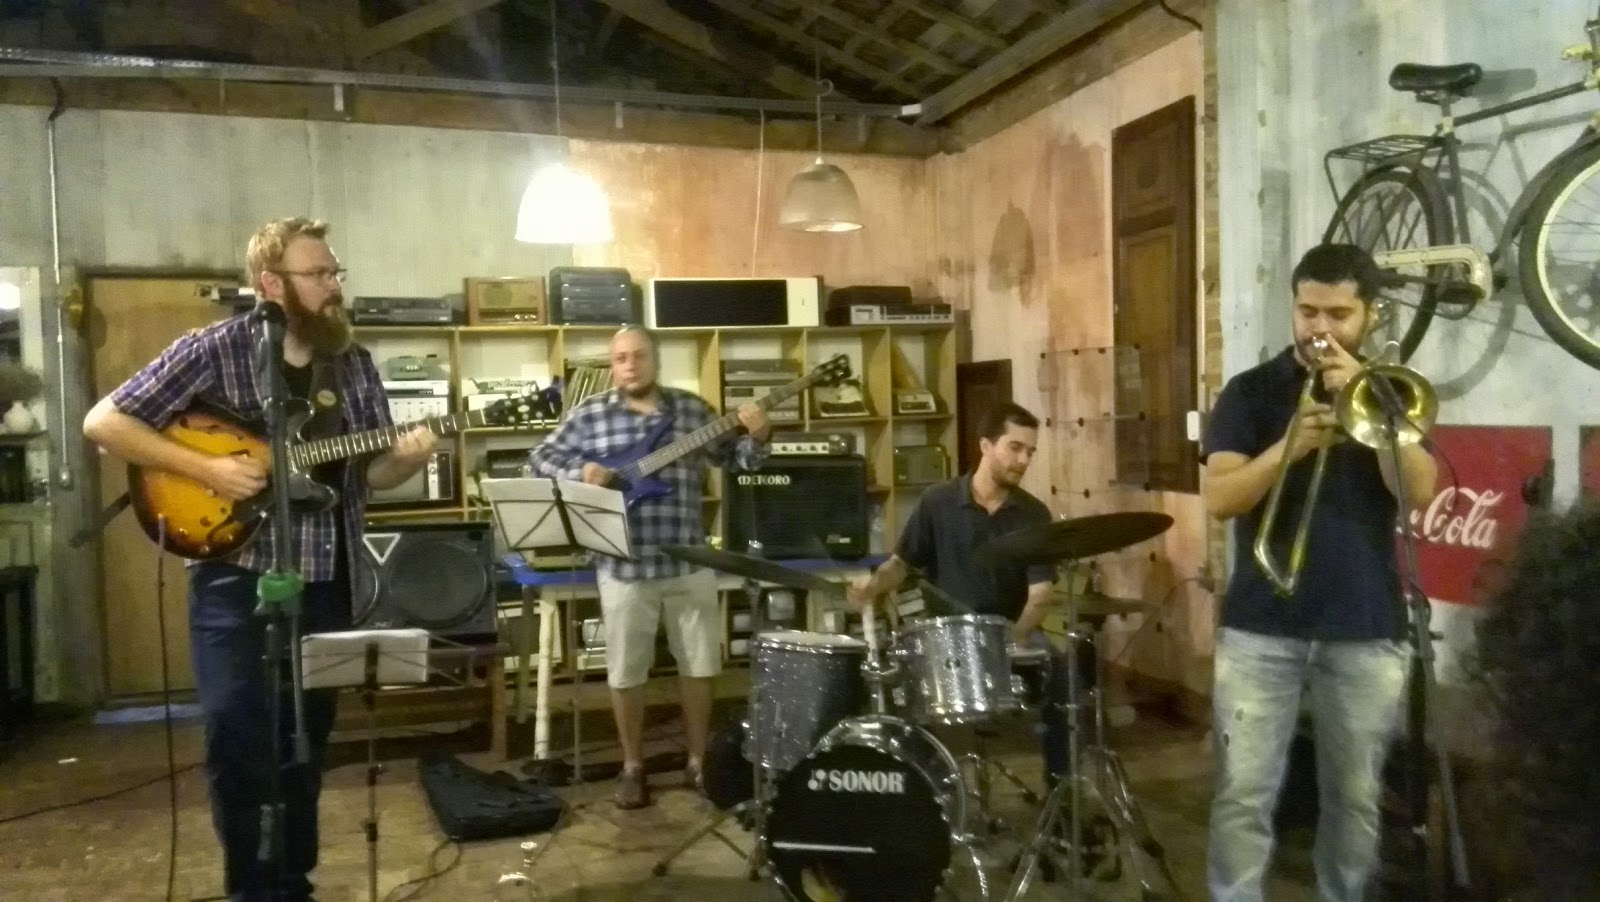 Aika 黒人 ブラジル音楽修行、それはブラジル人的生活。: おもしろい